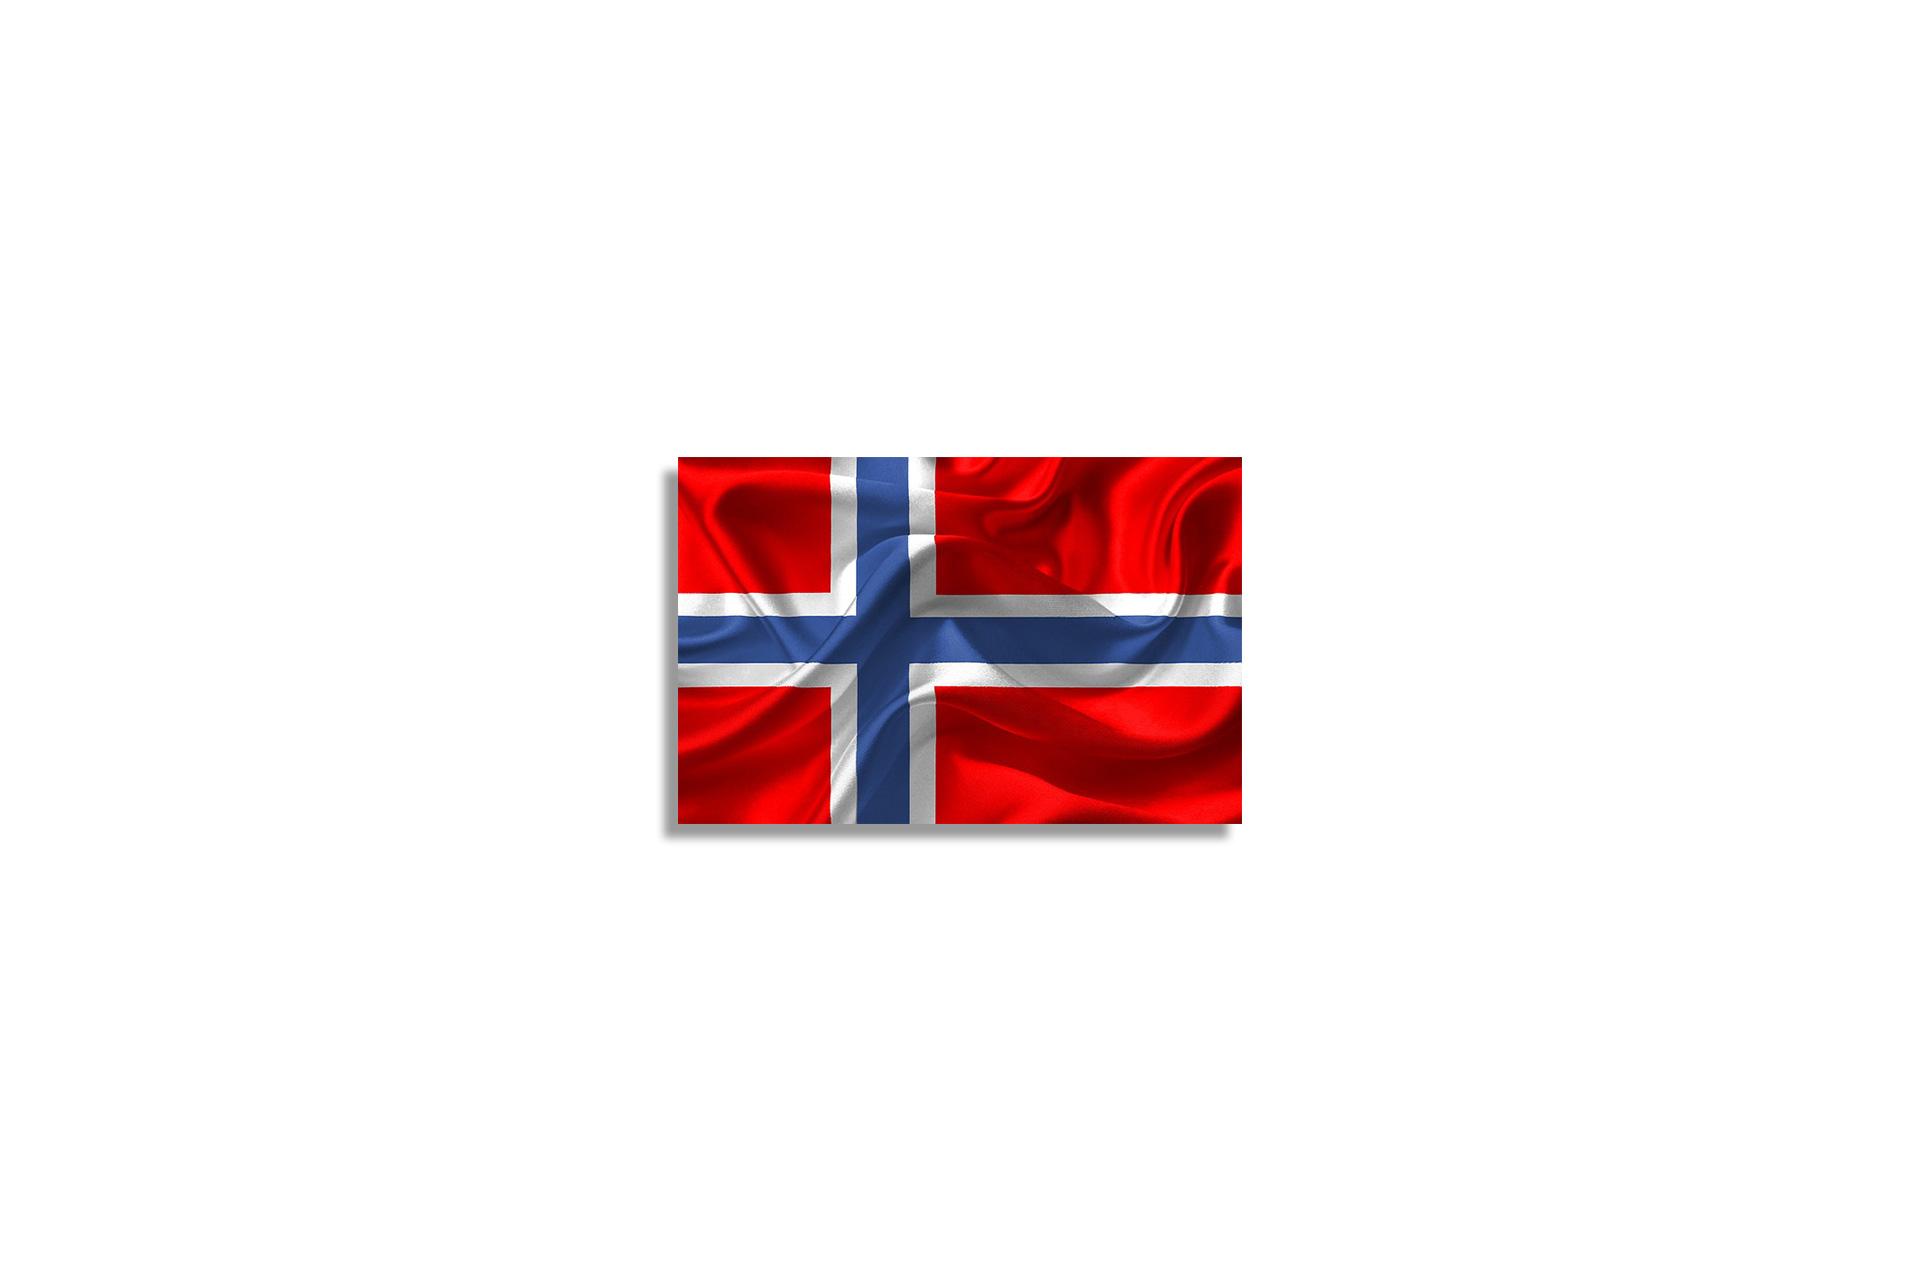 اقتصاد فوقالعاده نروژ